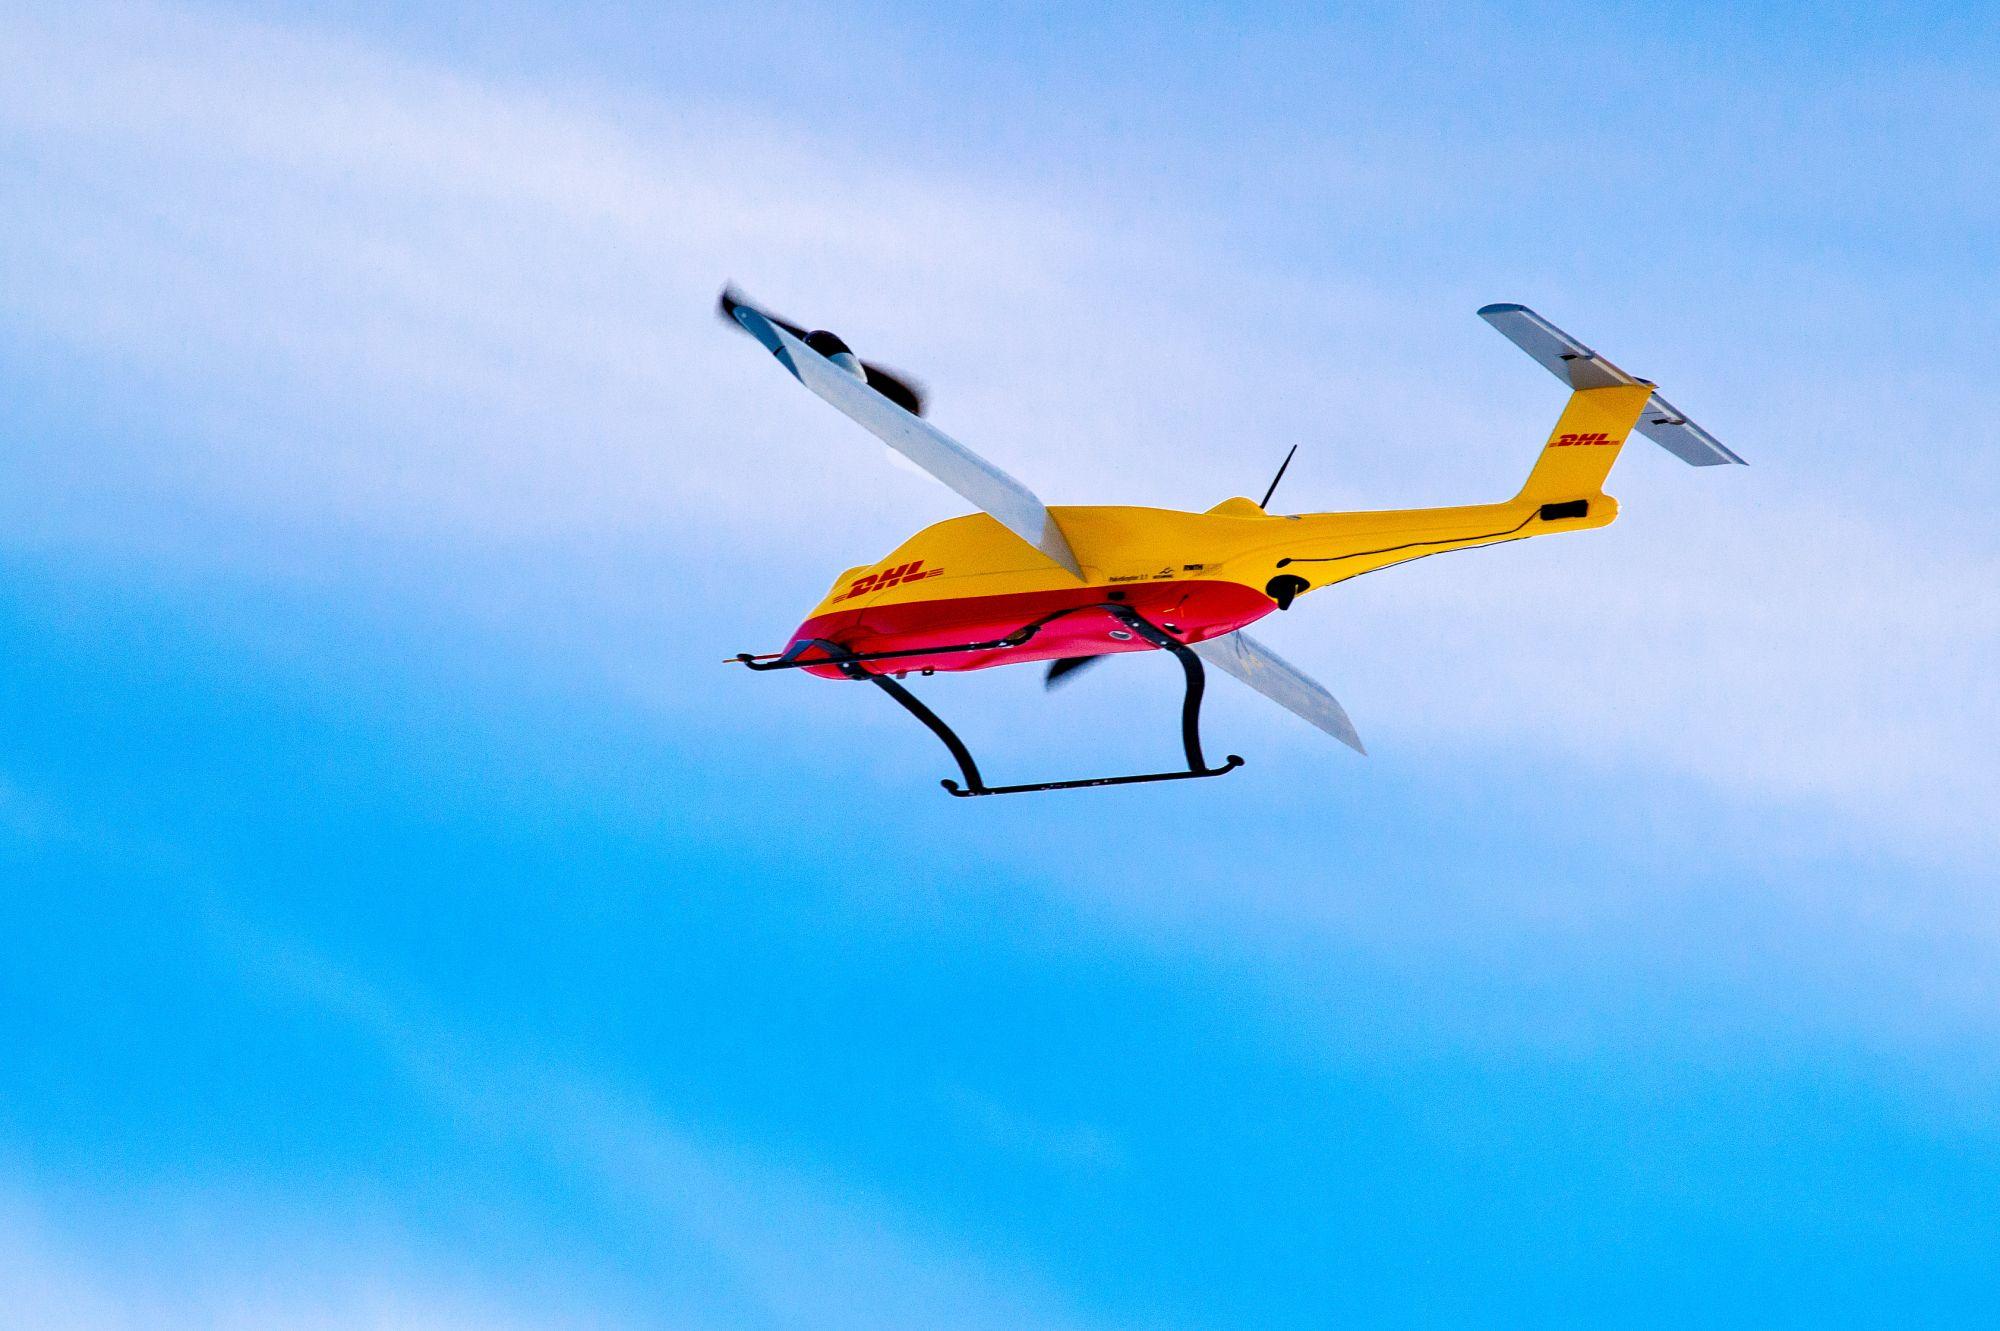 Dhl_parcelcopter